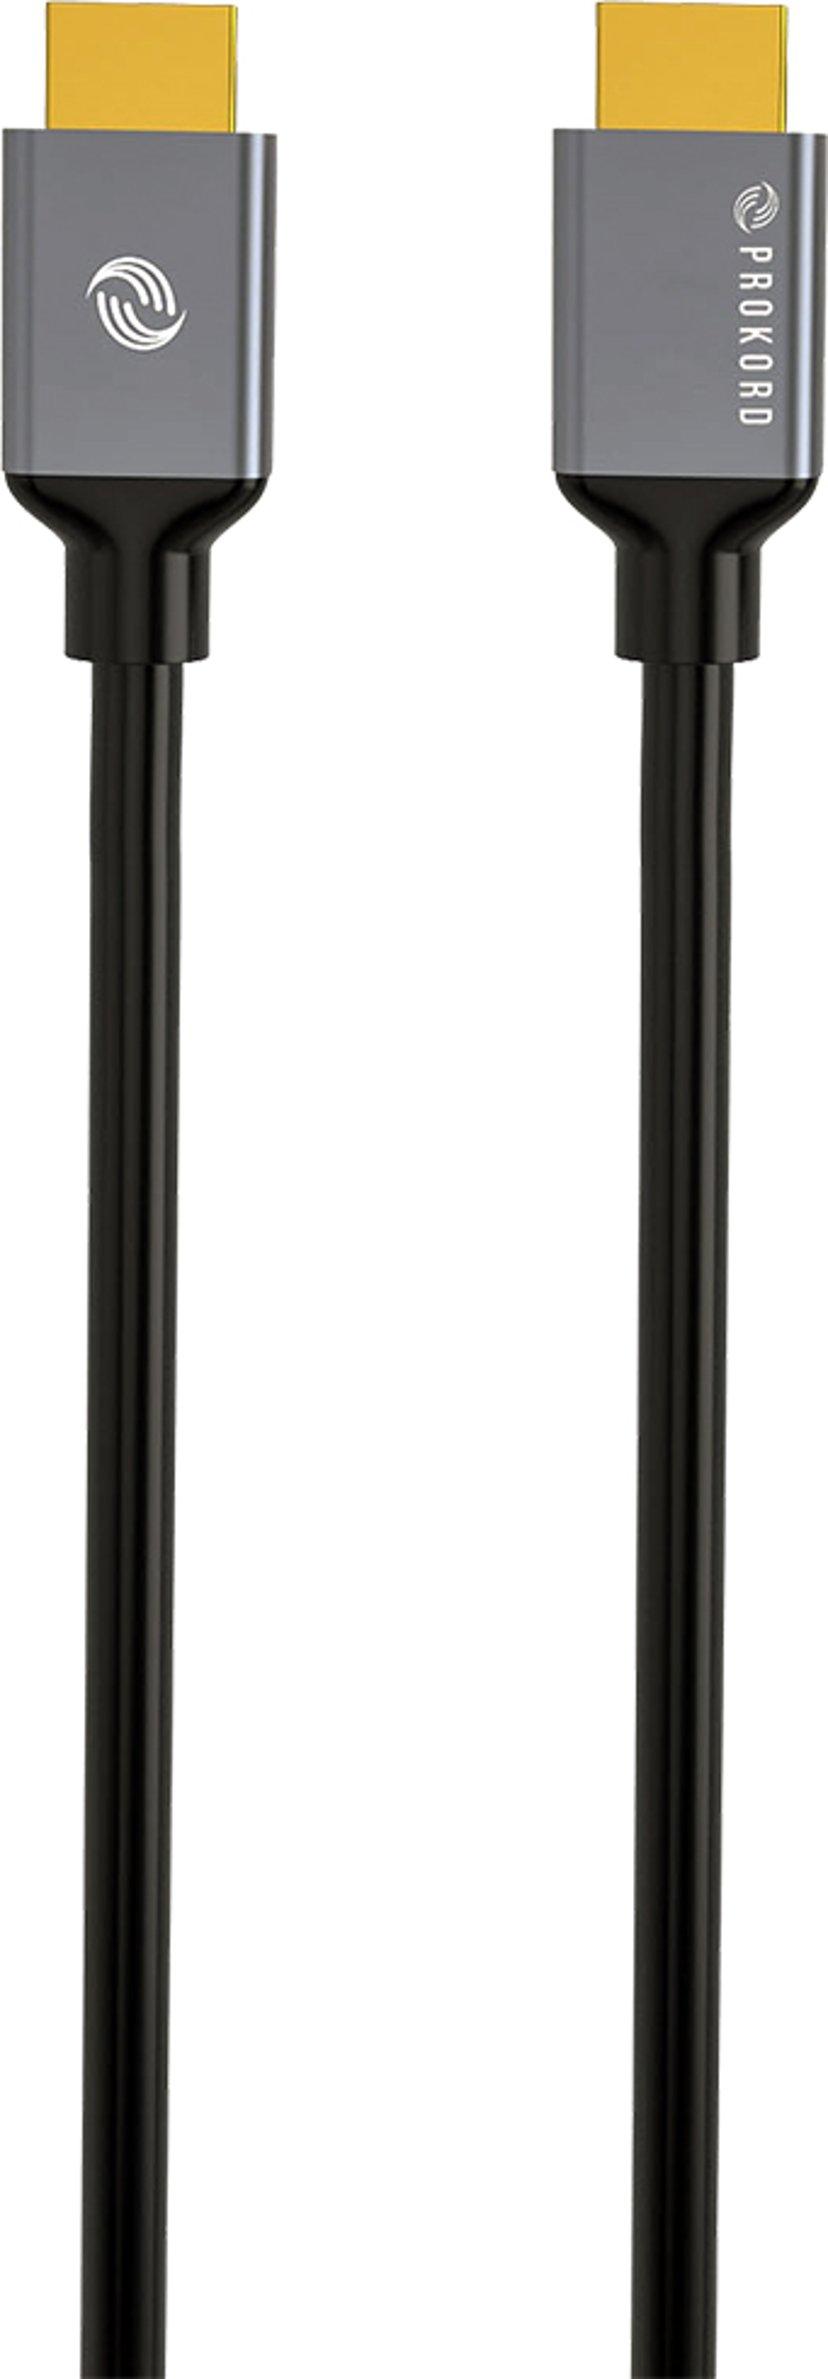 Prokord Black HDMI 2.0 5.0m 5m HDMI Hane HDMI Hane